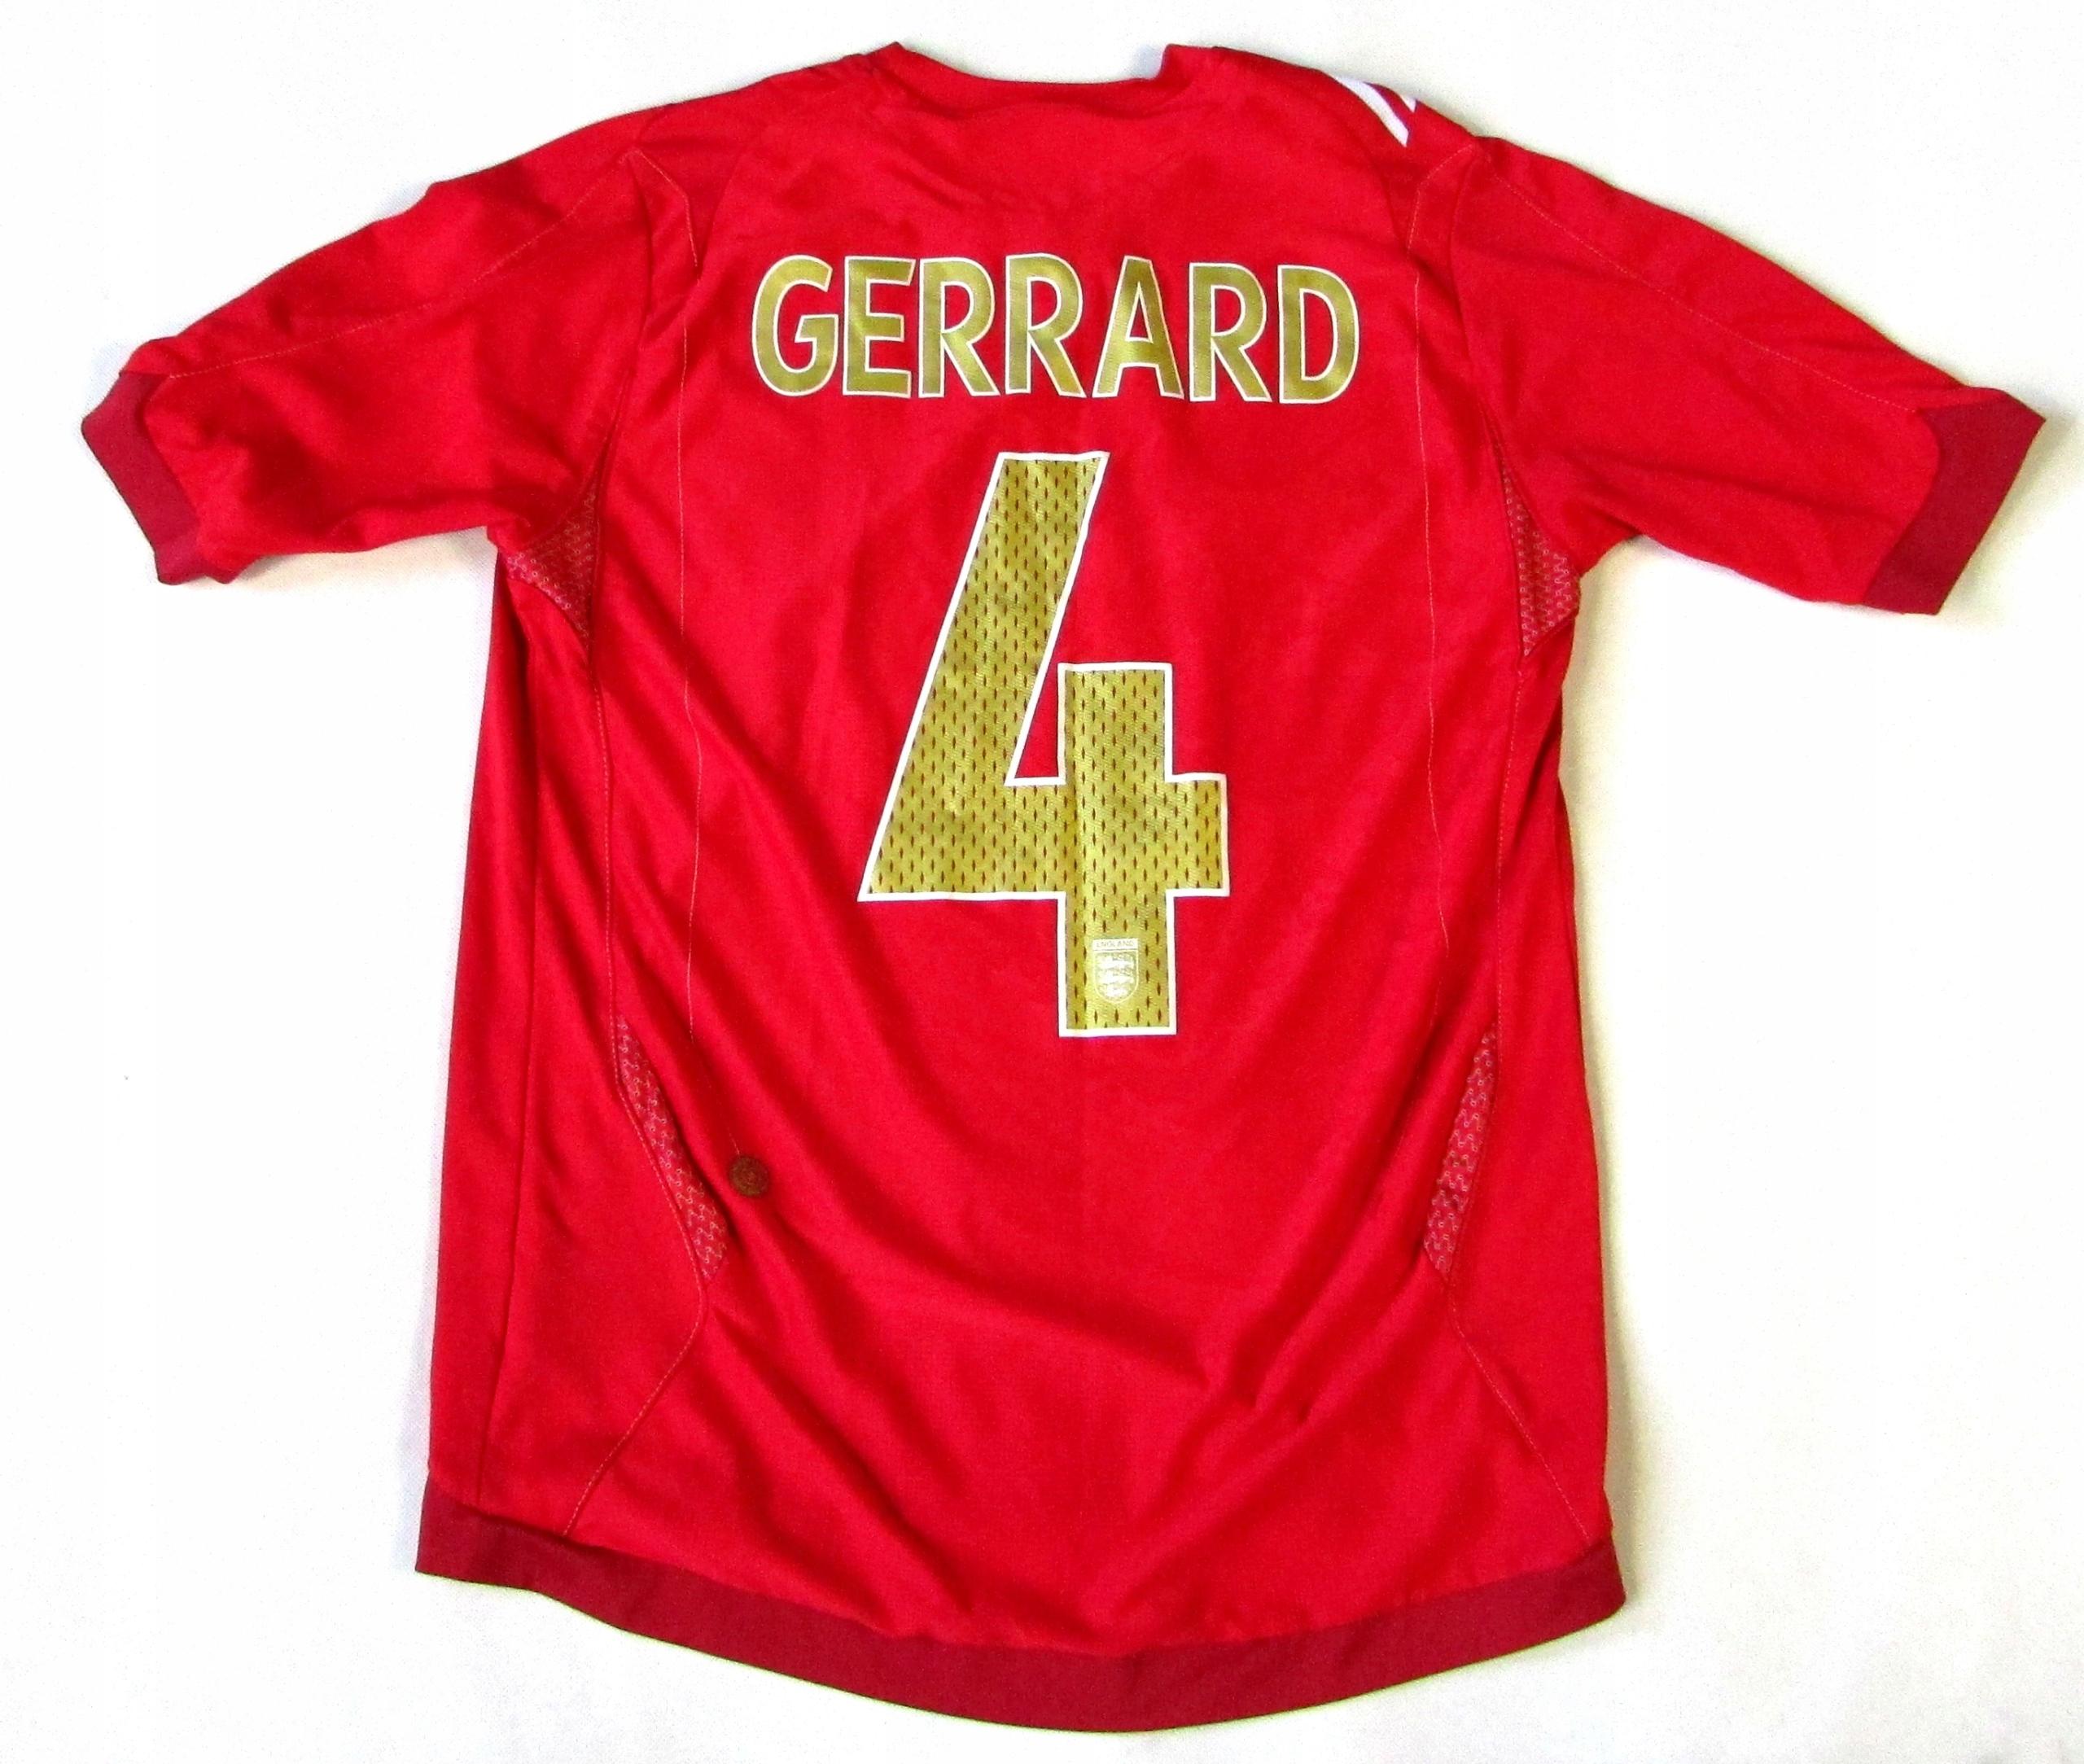 ANGLIA__Oficjalna koszulka_S.GERRARD_2006-08